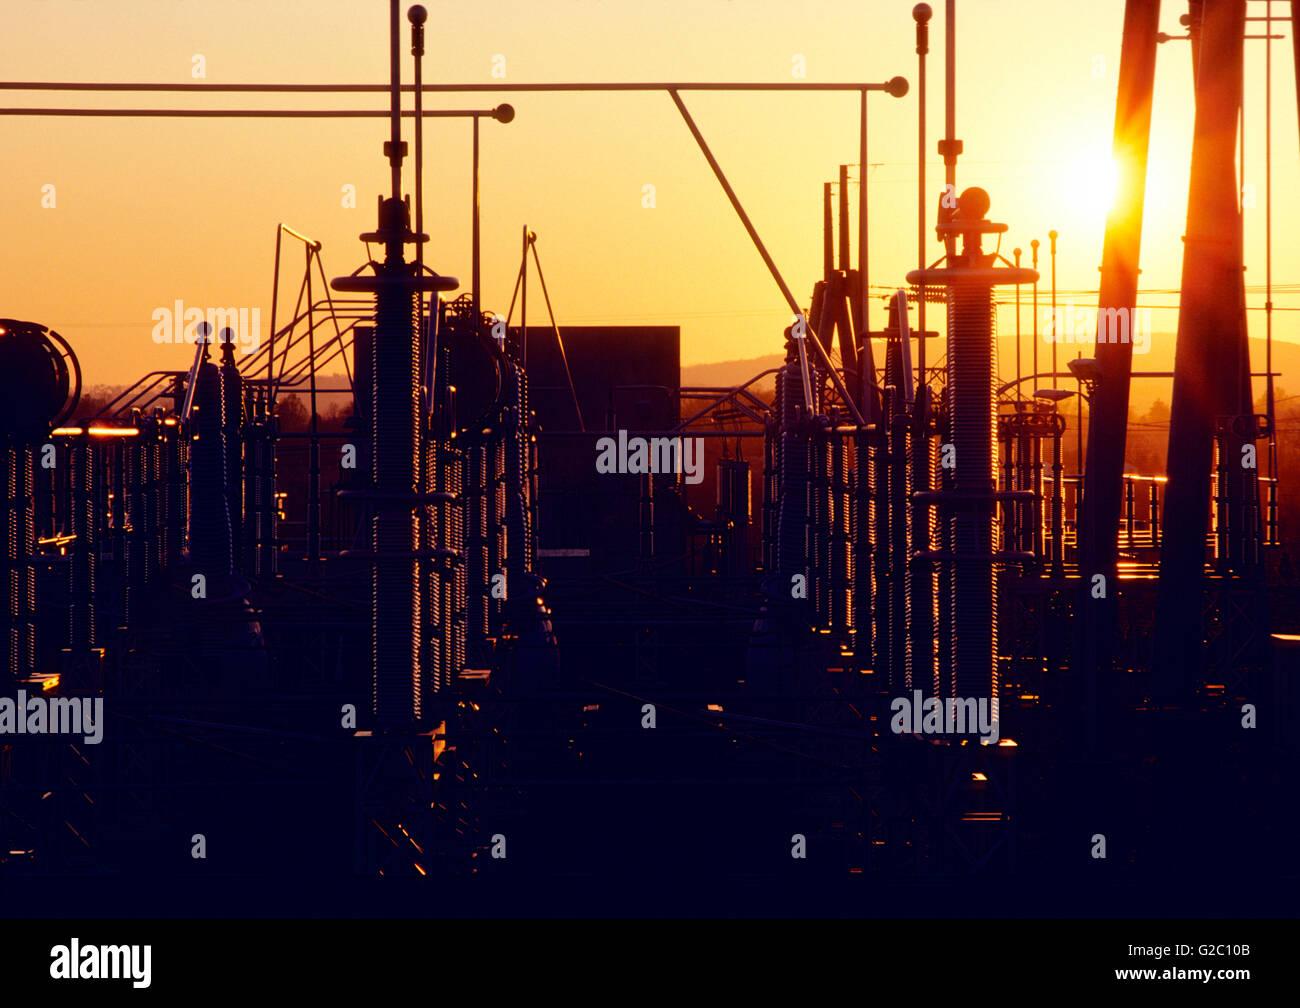 Der elektrischen Übertragung Hof bei Sonnenuntergang, Limerick Atomkraftwerk, Limerick, Pennsylvania, USA Stockbild